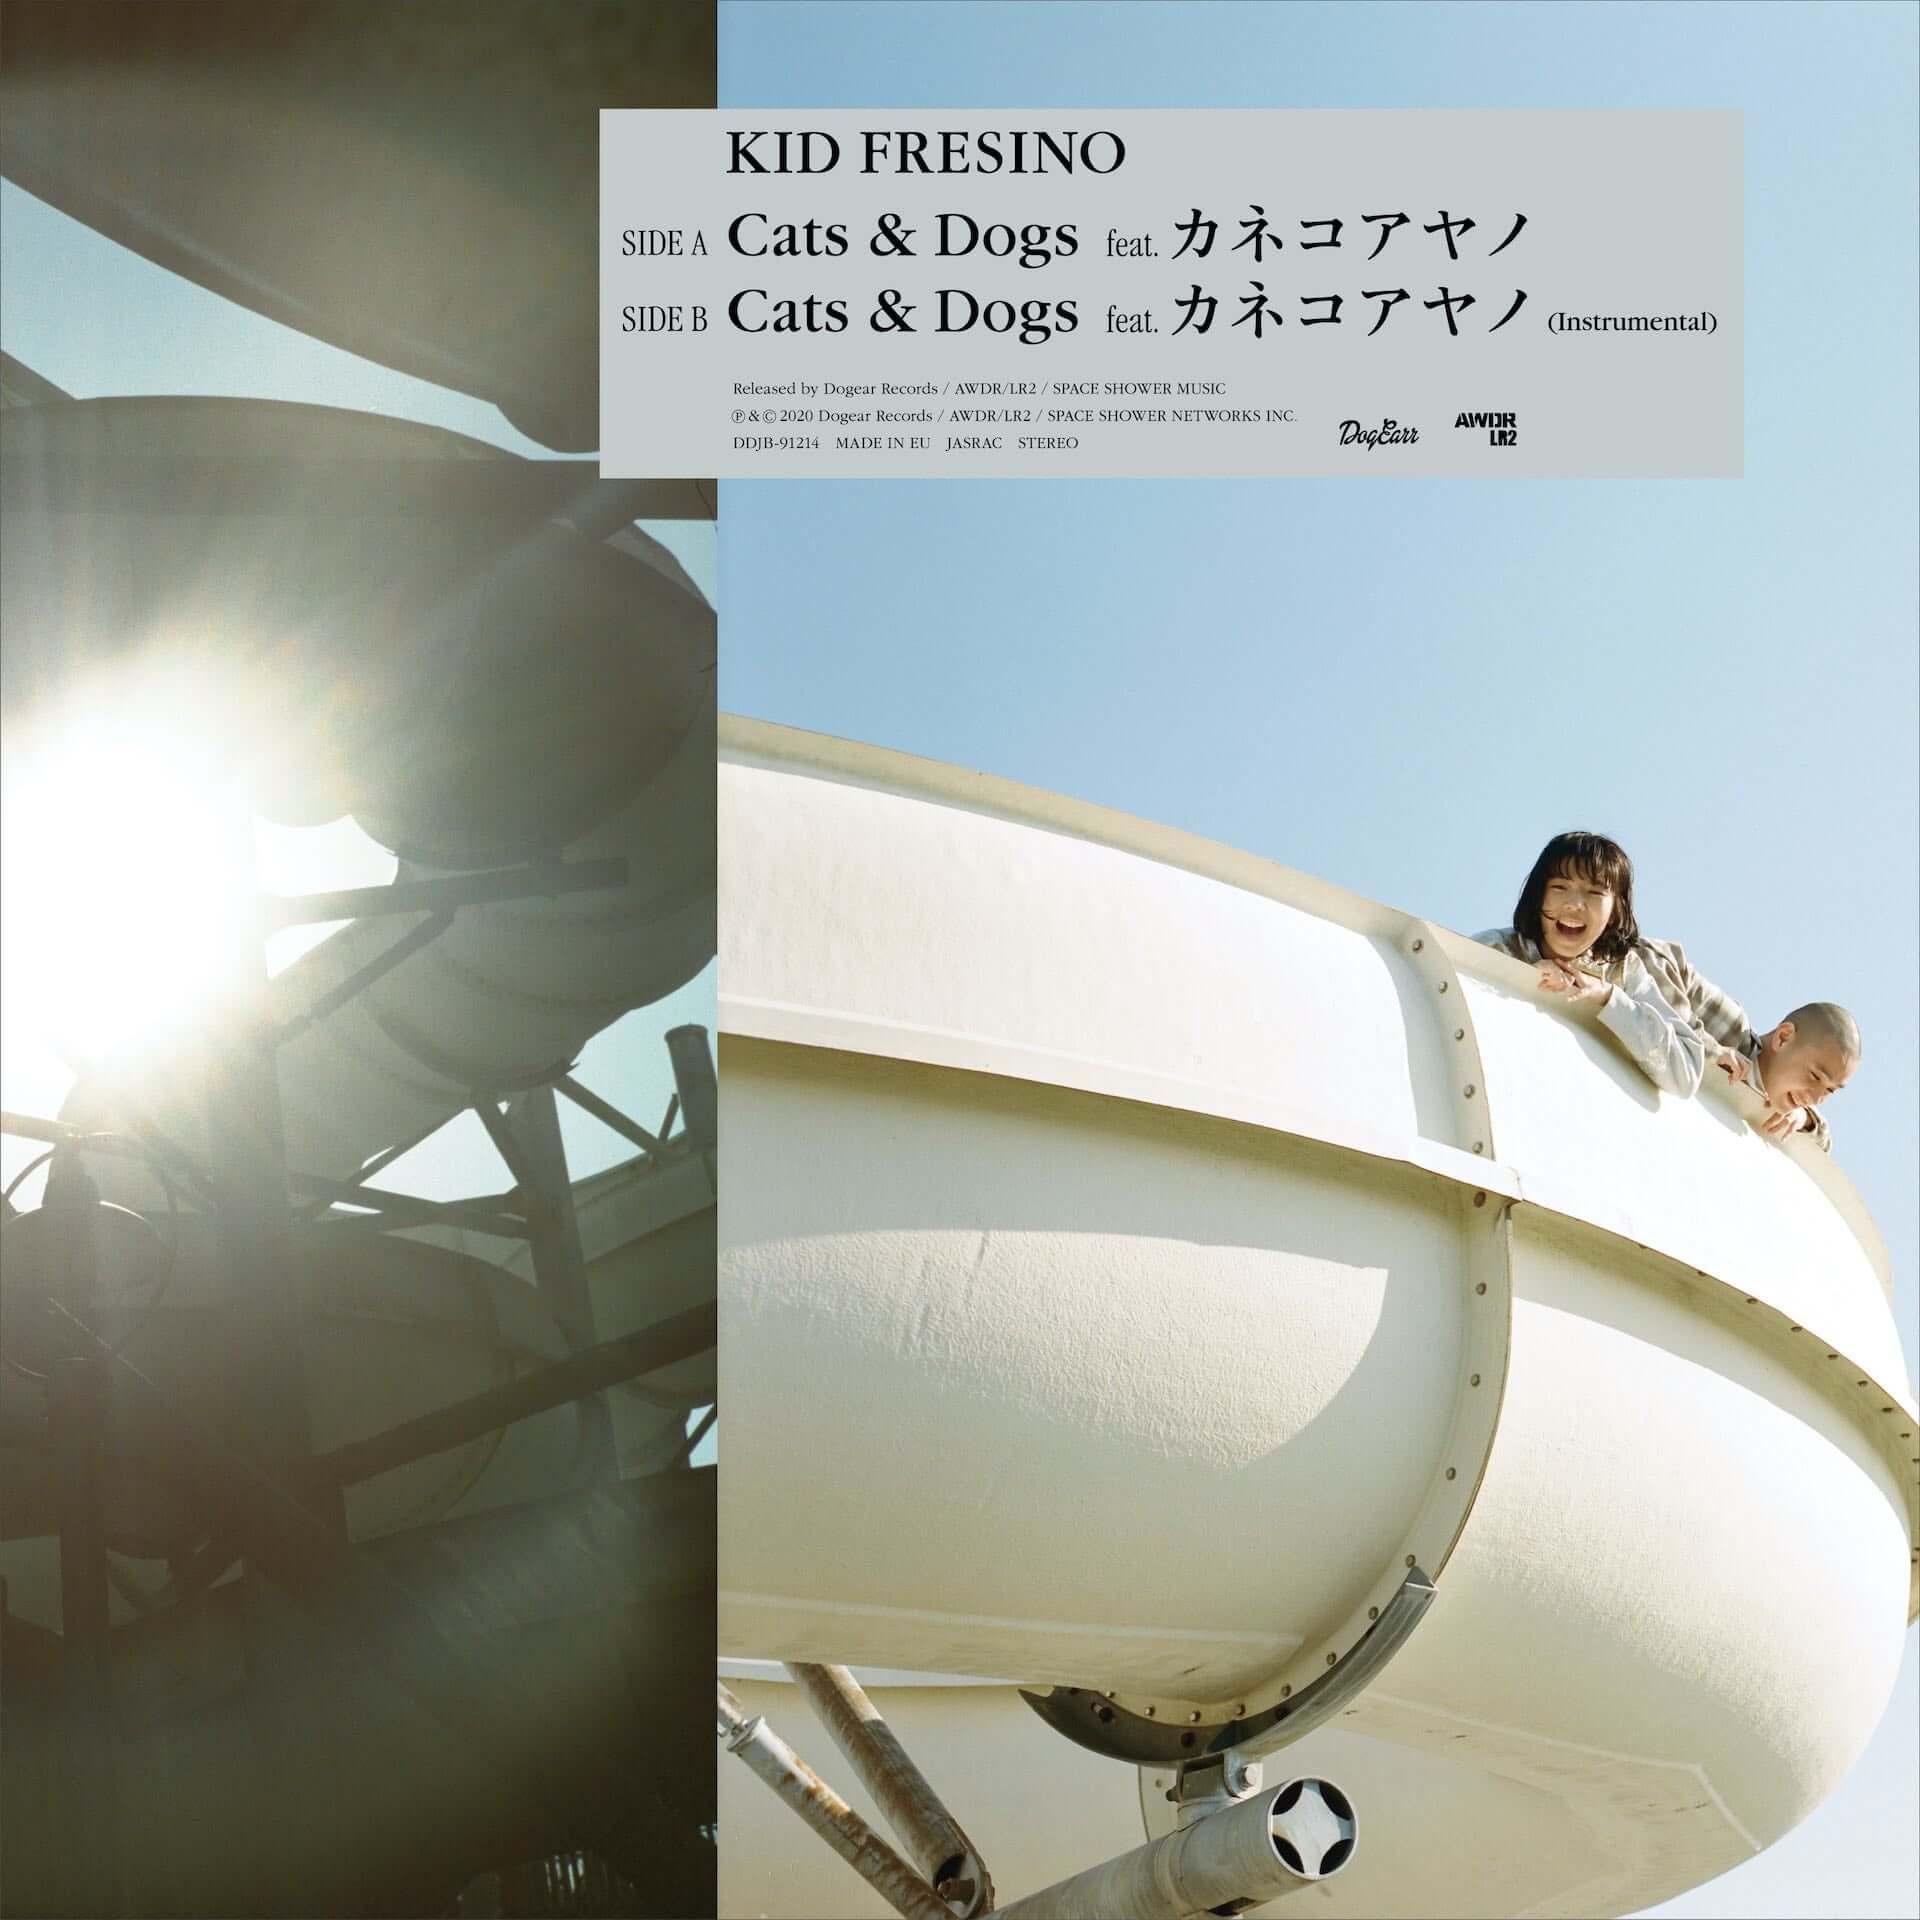 "KID FRESINOとカネコアヤノのコラボ曲""Cats & Dogs""がアナログ化決定!スペースシャワーTV『Black File』でのインタビュー動画も公開 music210201_kidfresino_2-1920x1920"